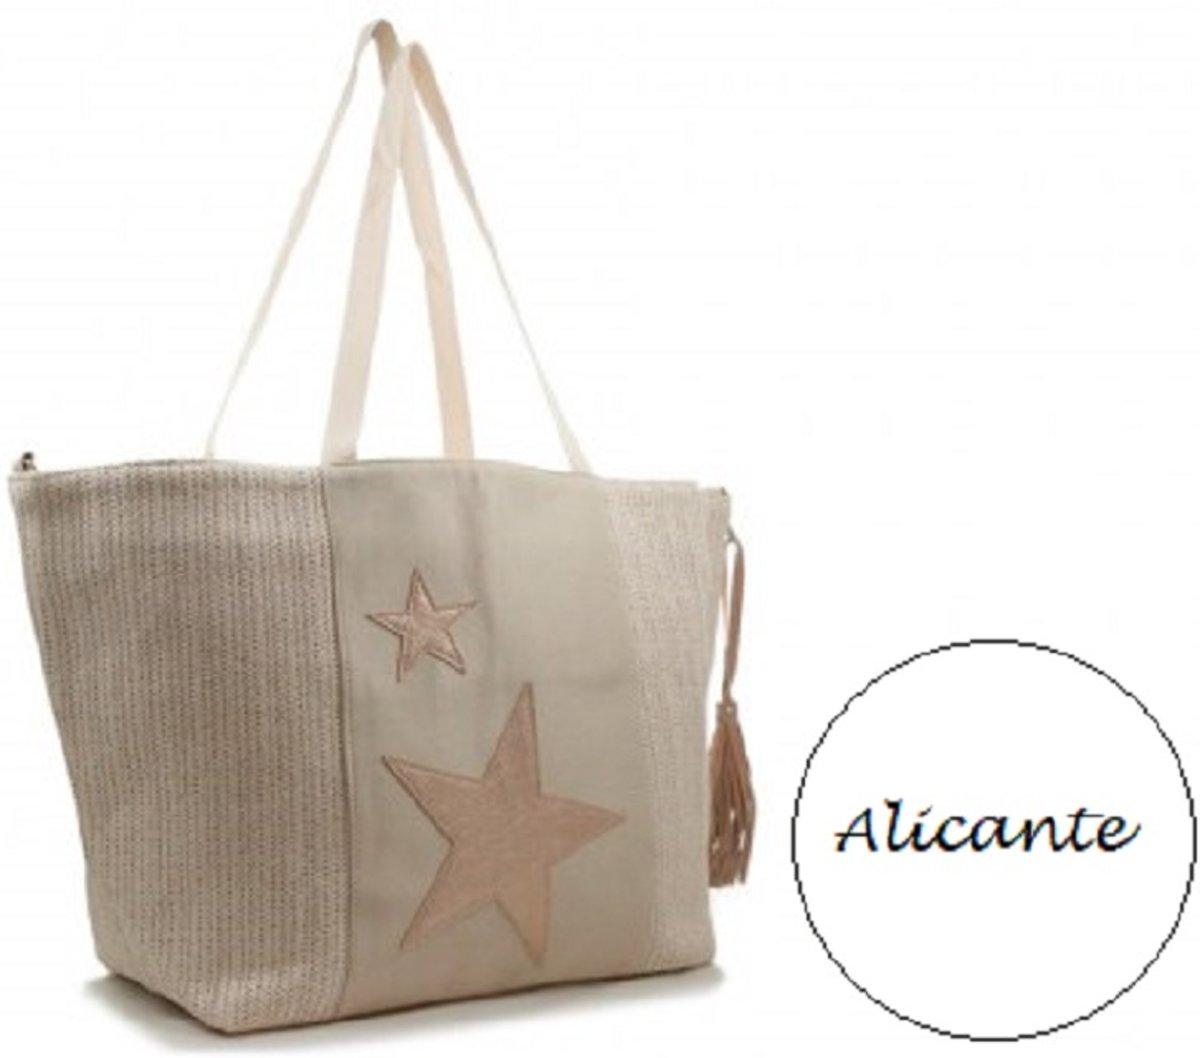 cb3dca0d907 bol.com | Stoere roze beach shopper - strandtas Alicante XL met sterren